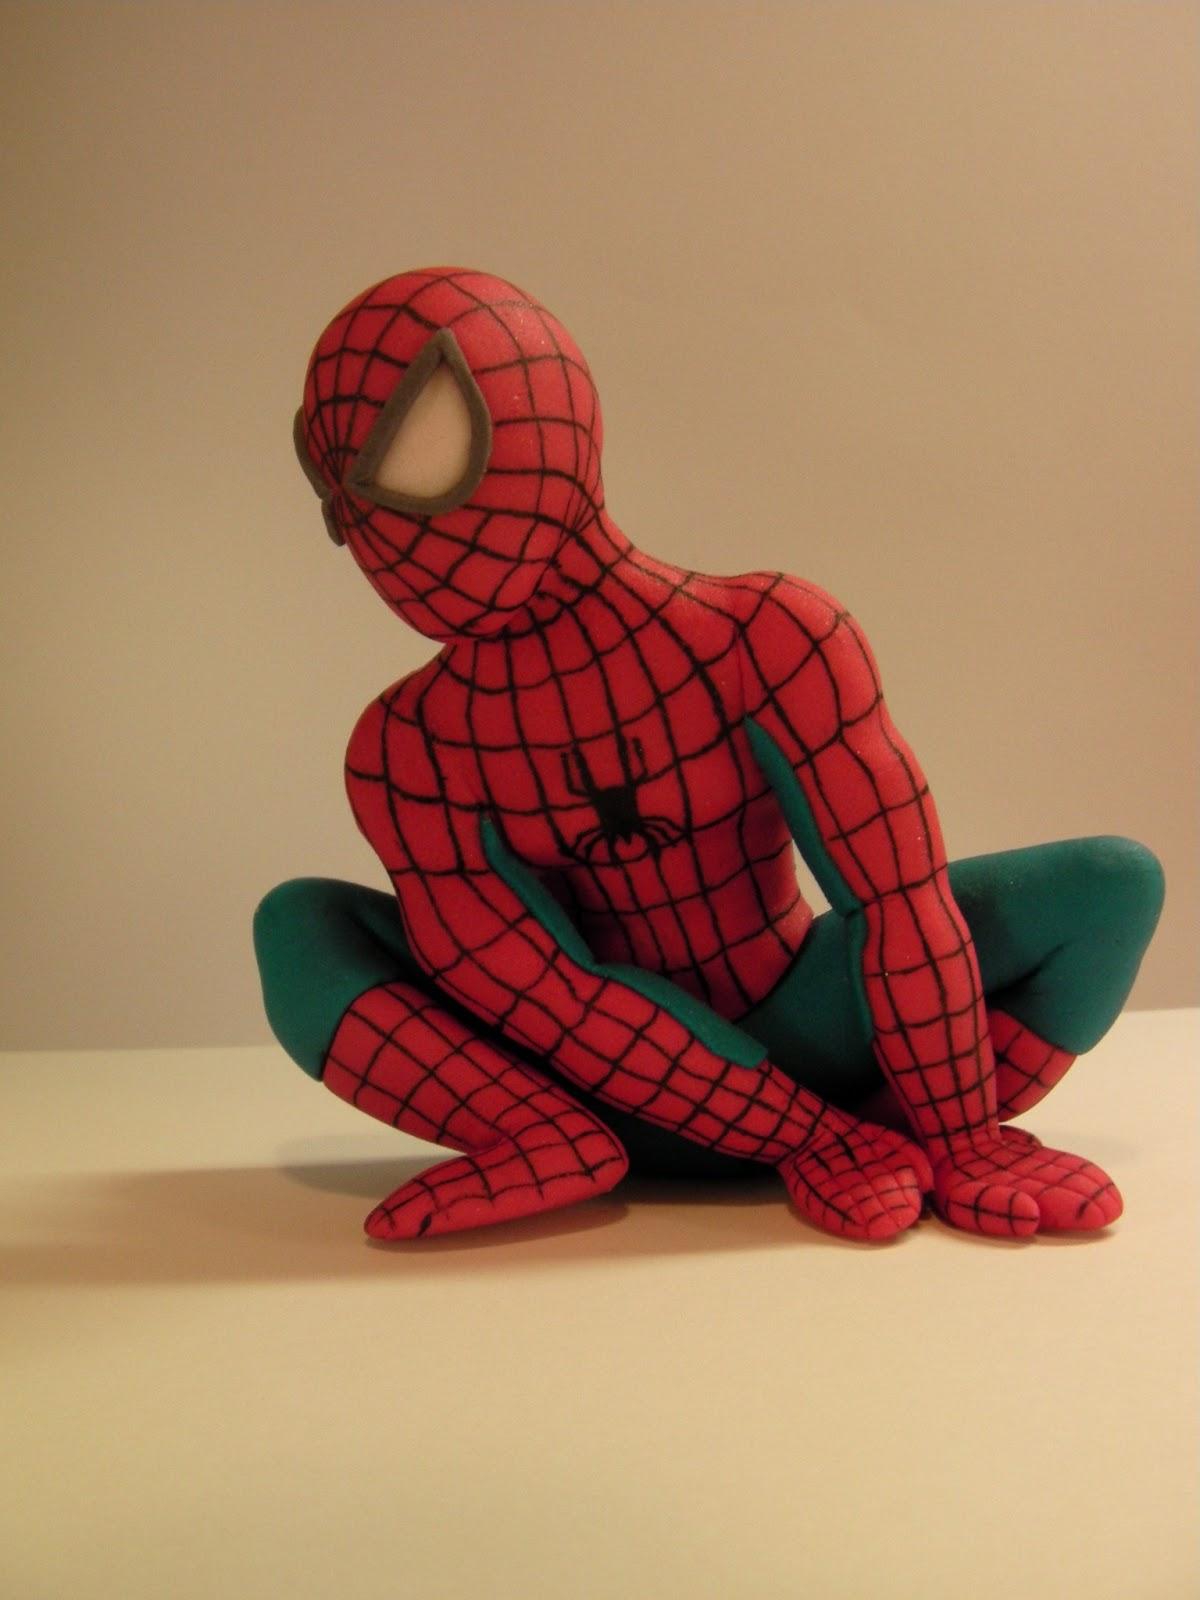 spiderman fondant figure spajdermen figurica za tortu. Black Bedroom Furniture Sets. Home Design Ideas